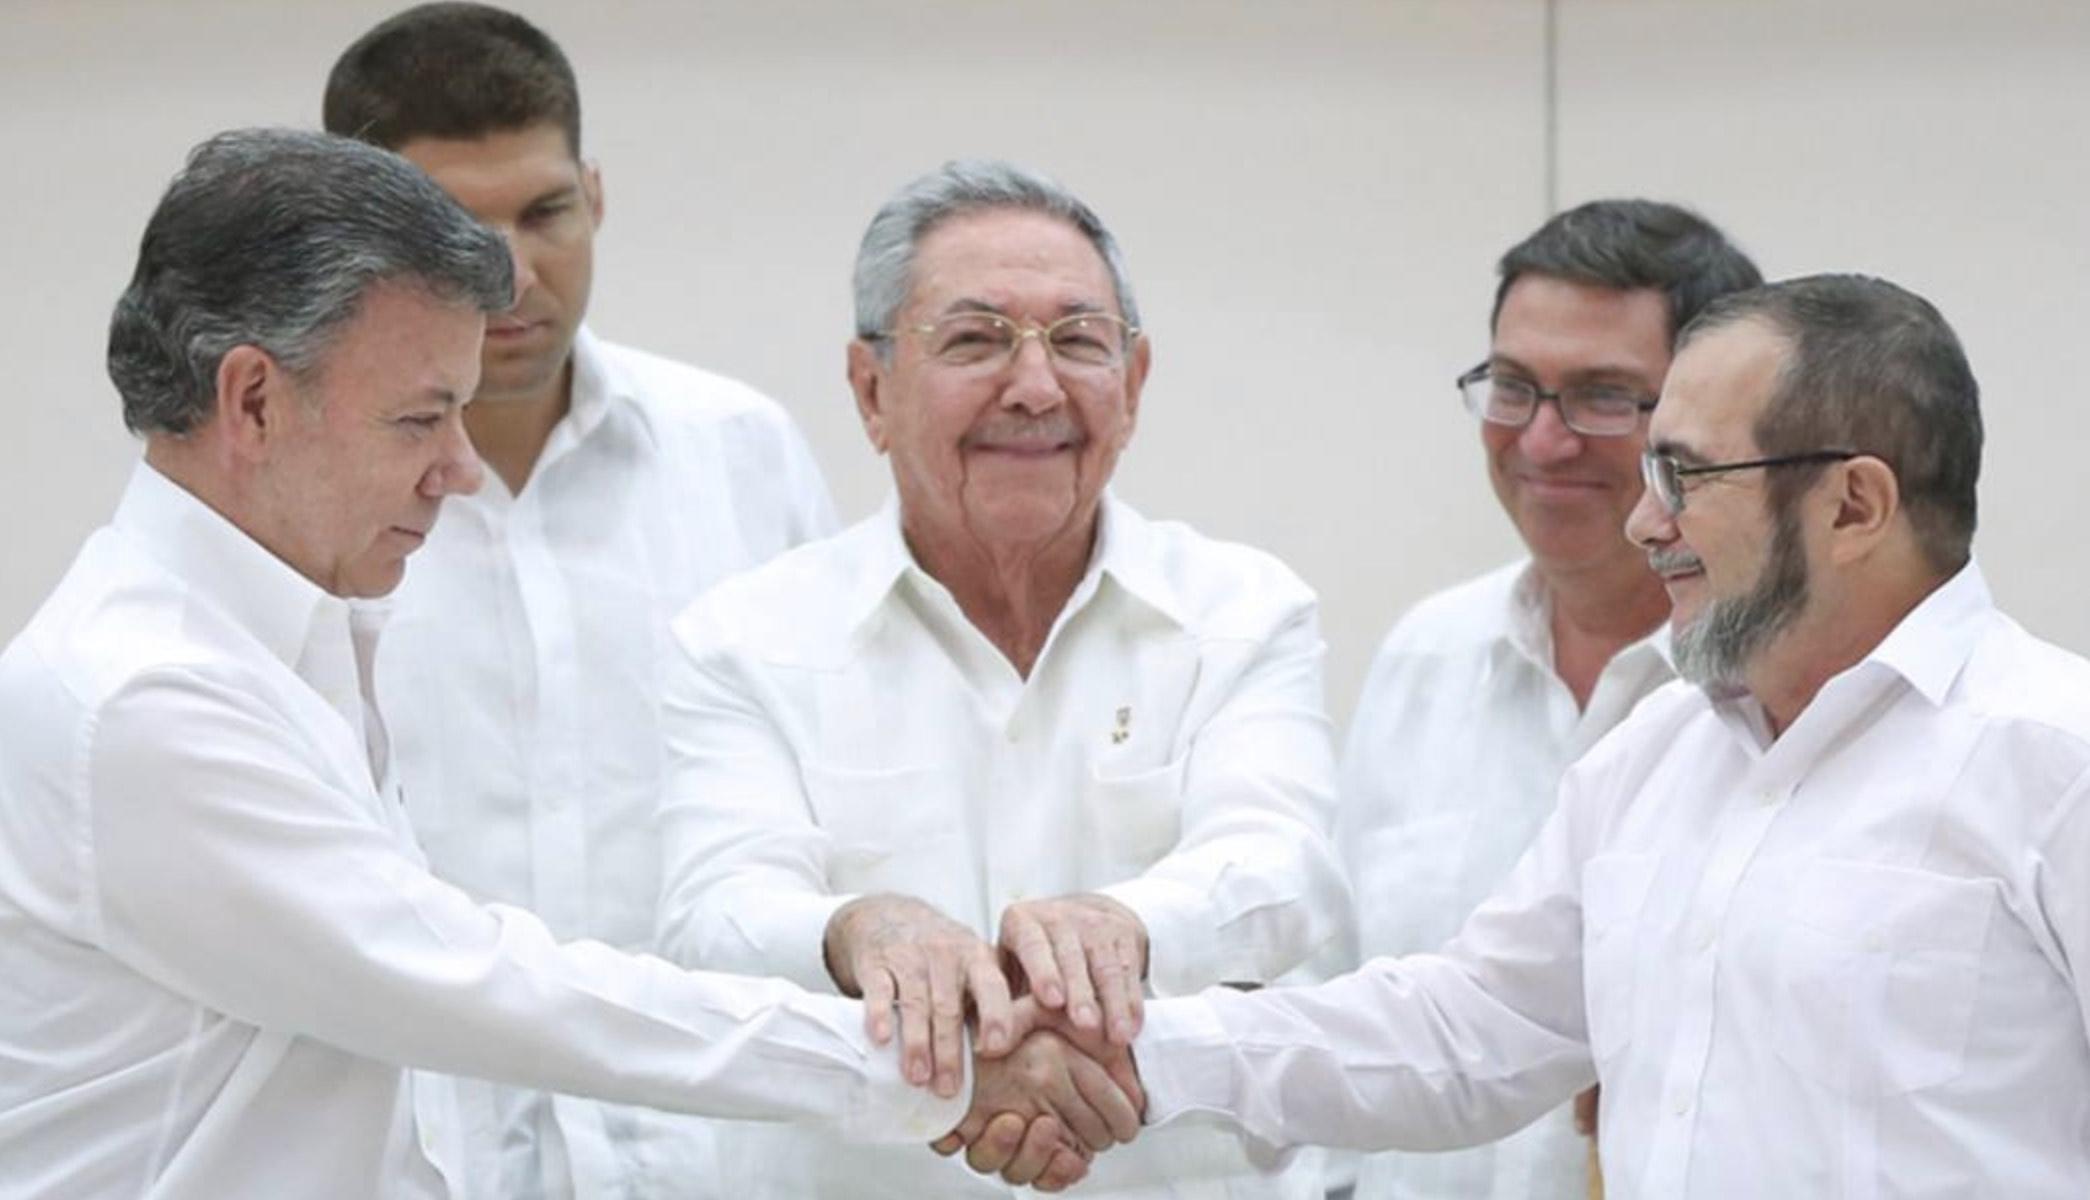 Juan Manuel Santos, Acuerdos de Paz, Narcoterrorismo